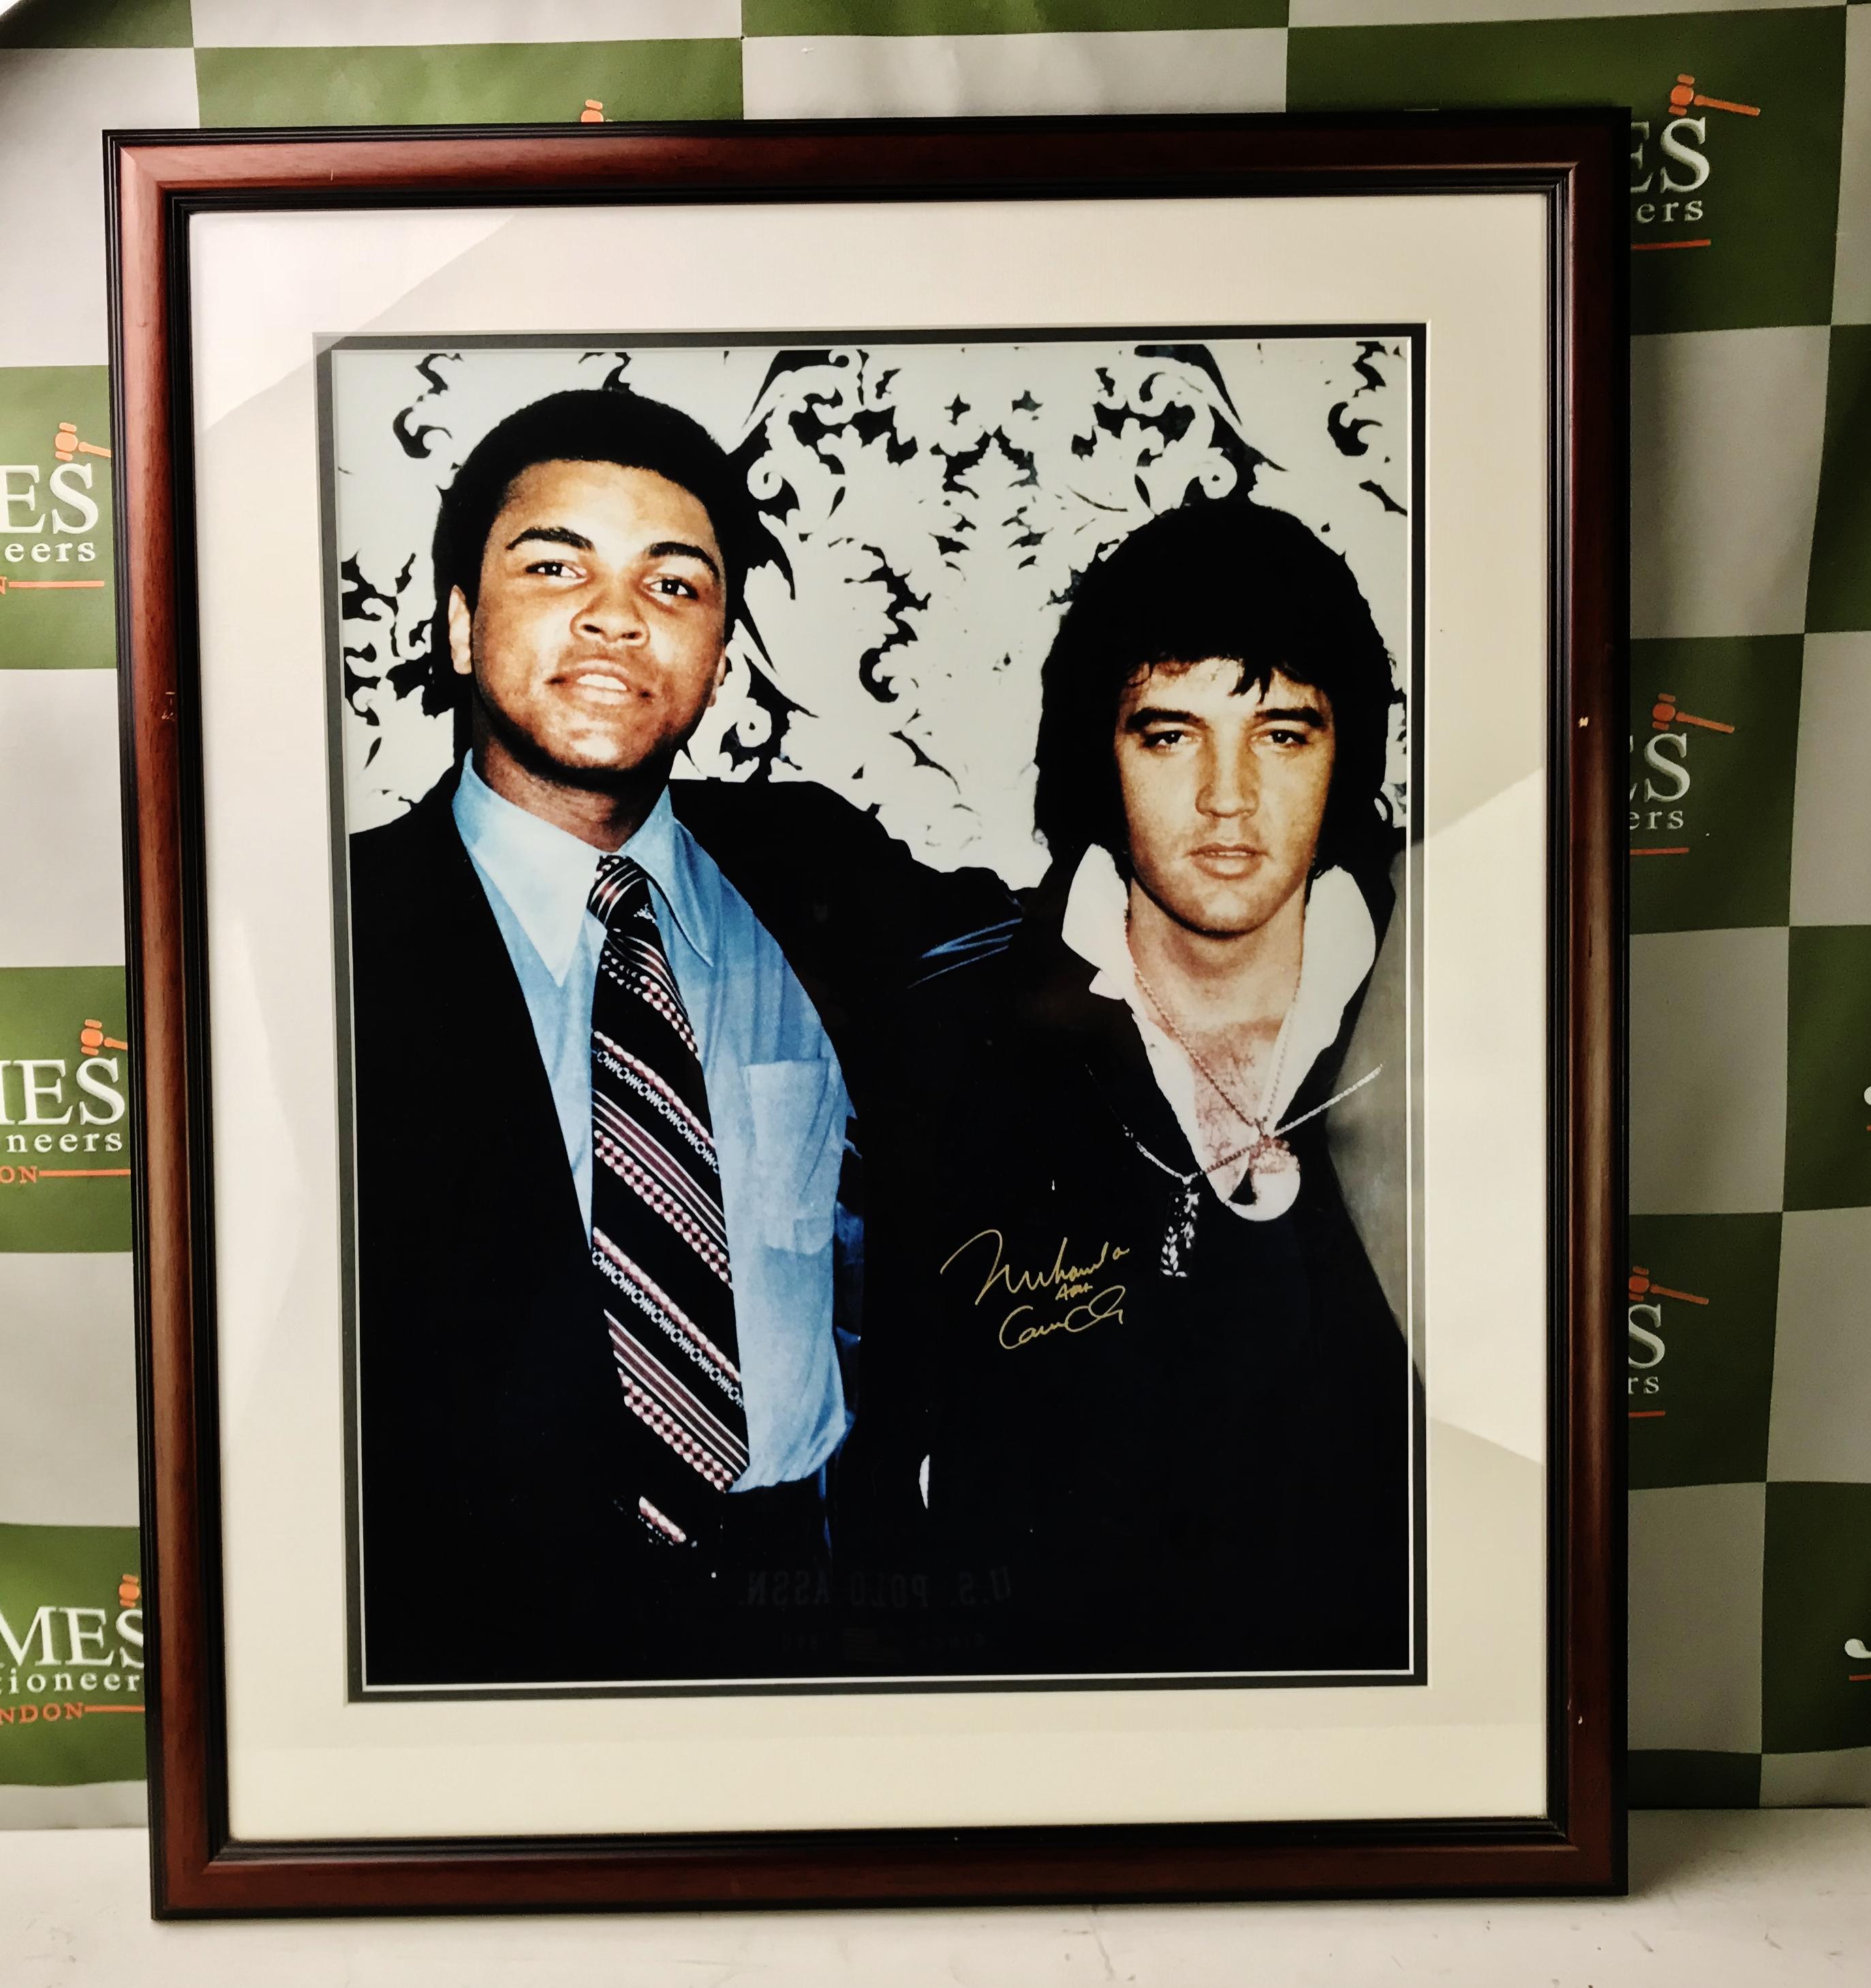 Lot 57 - Muhammad Ali & Elvis Presley Montage,Signed By Muhammad Ali.